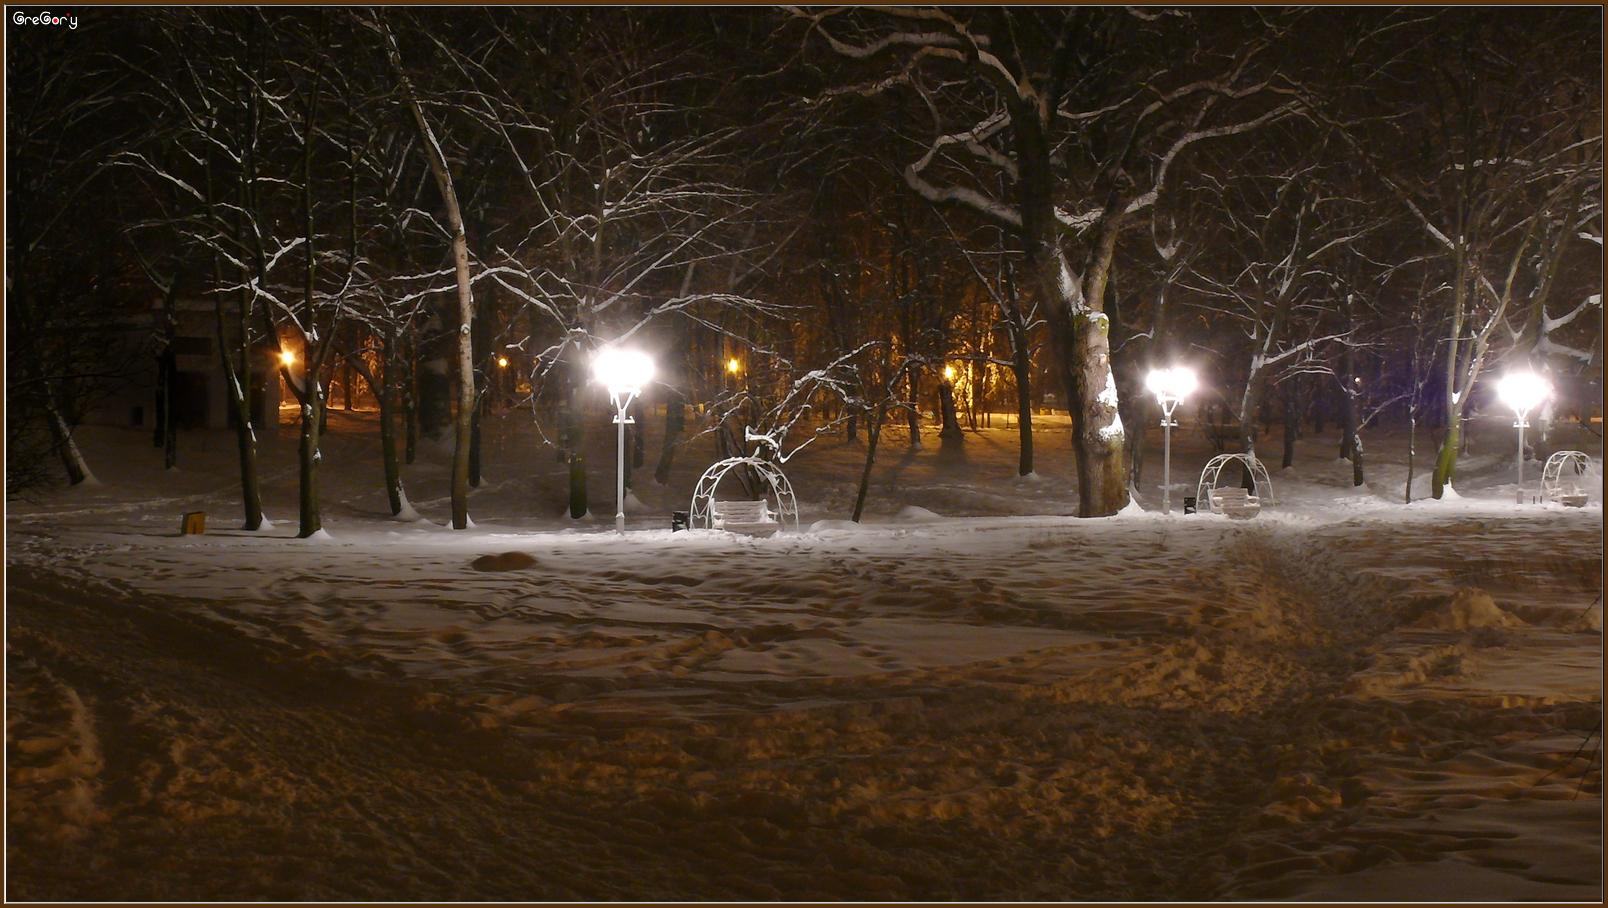 Парк у м. Вінниці / Park in Vinnytsya * 05.02.2012 19:33:12